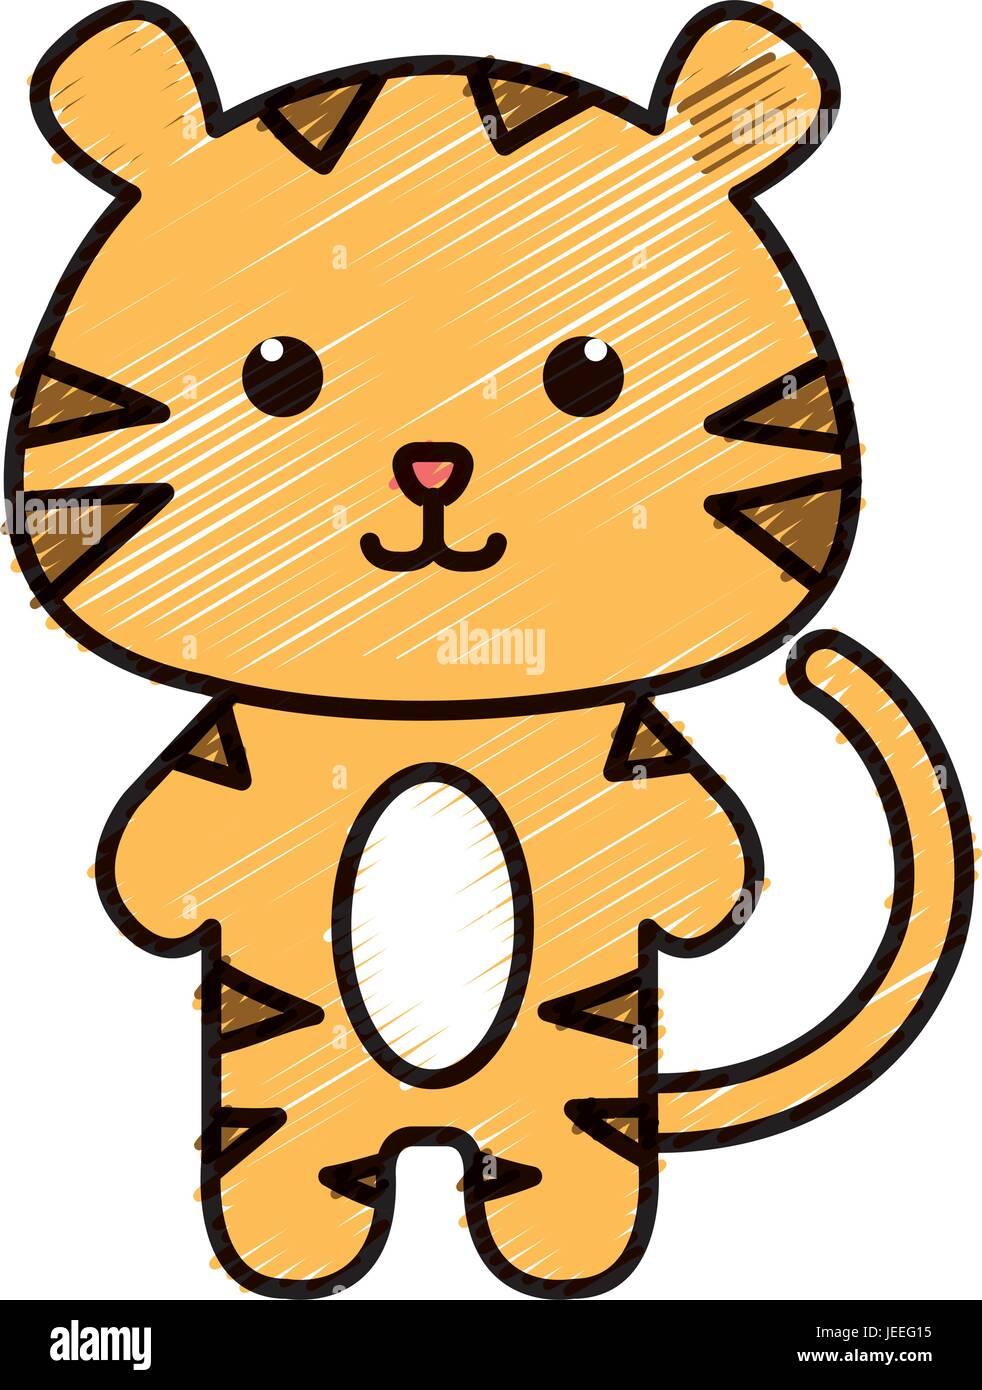 Stuffed Animal Tiger Icon Vector Illustration Design Doodle Stock Vector Image Art Alamy